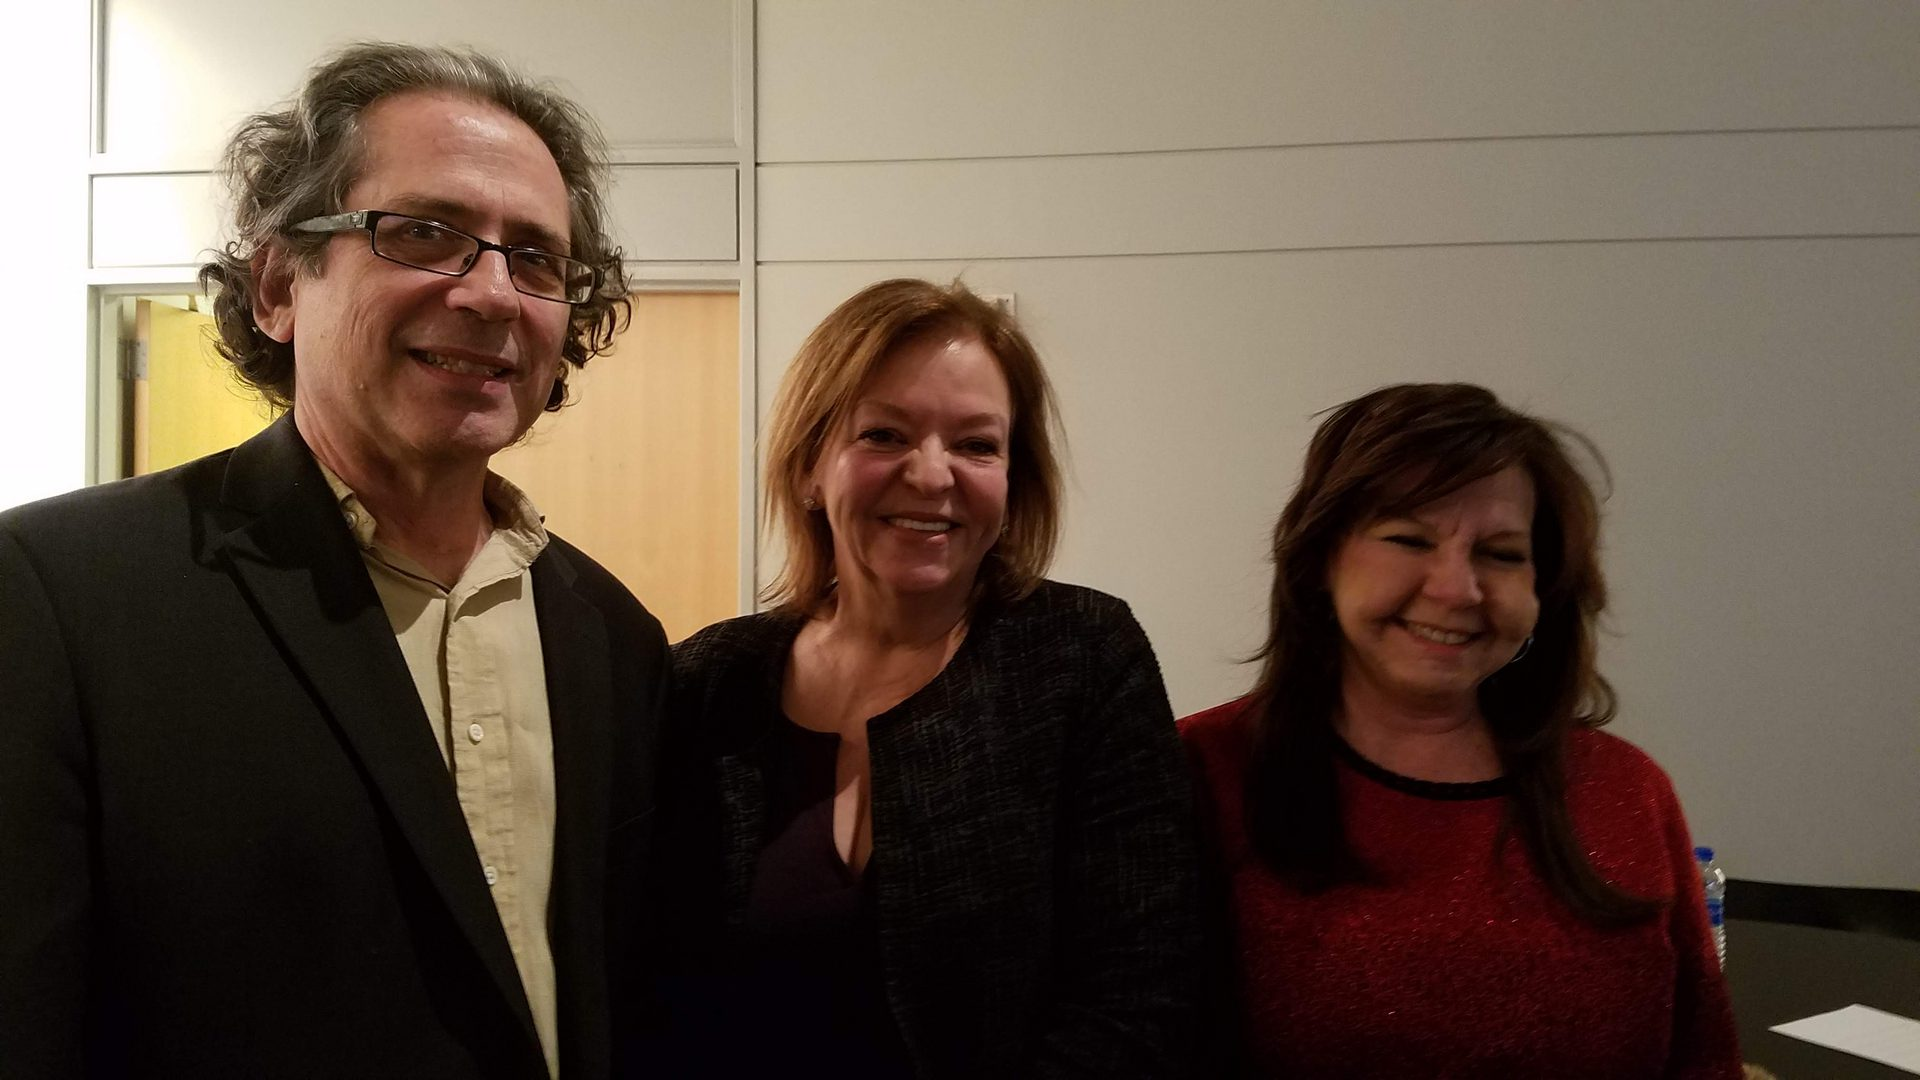 Three people smiling